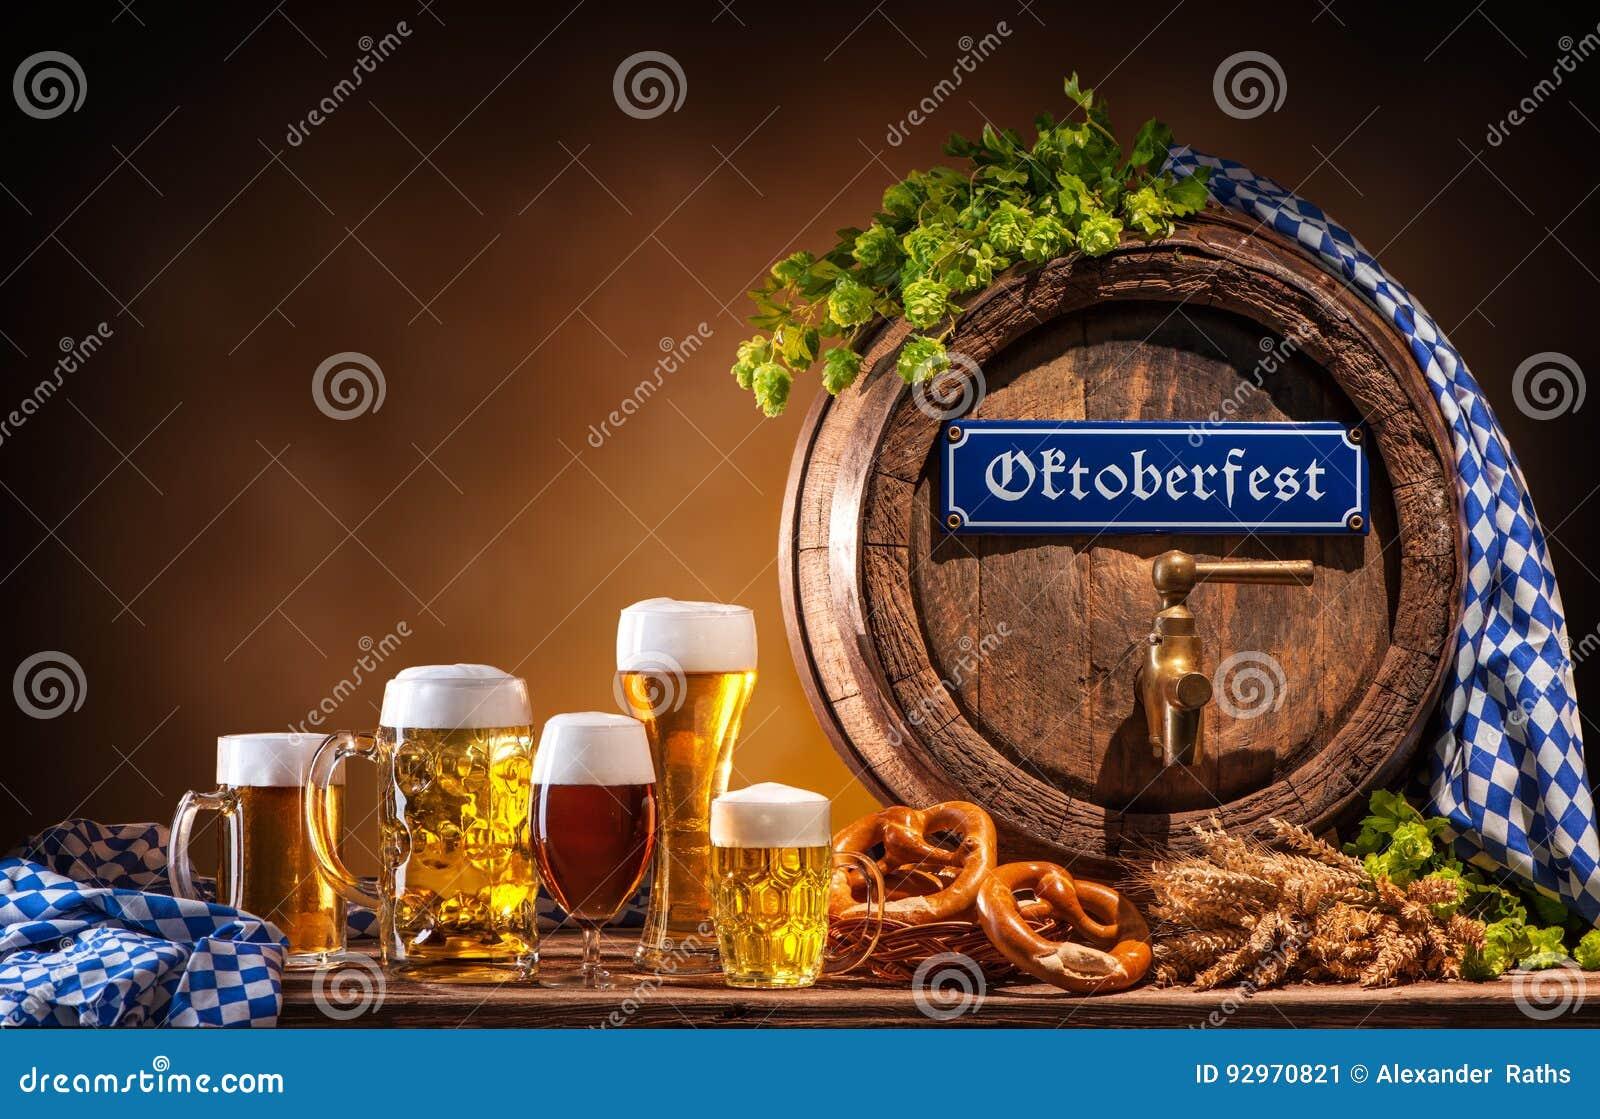 Tambor de cerveja de Oktoberfest e vidros de cerveja